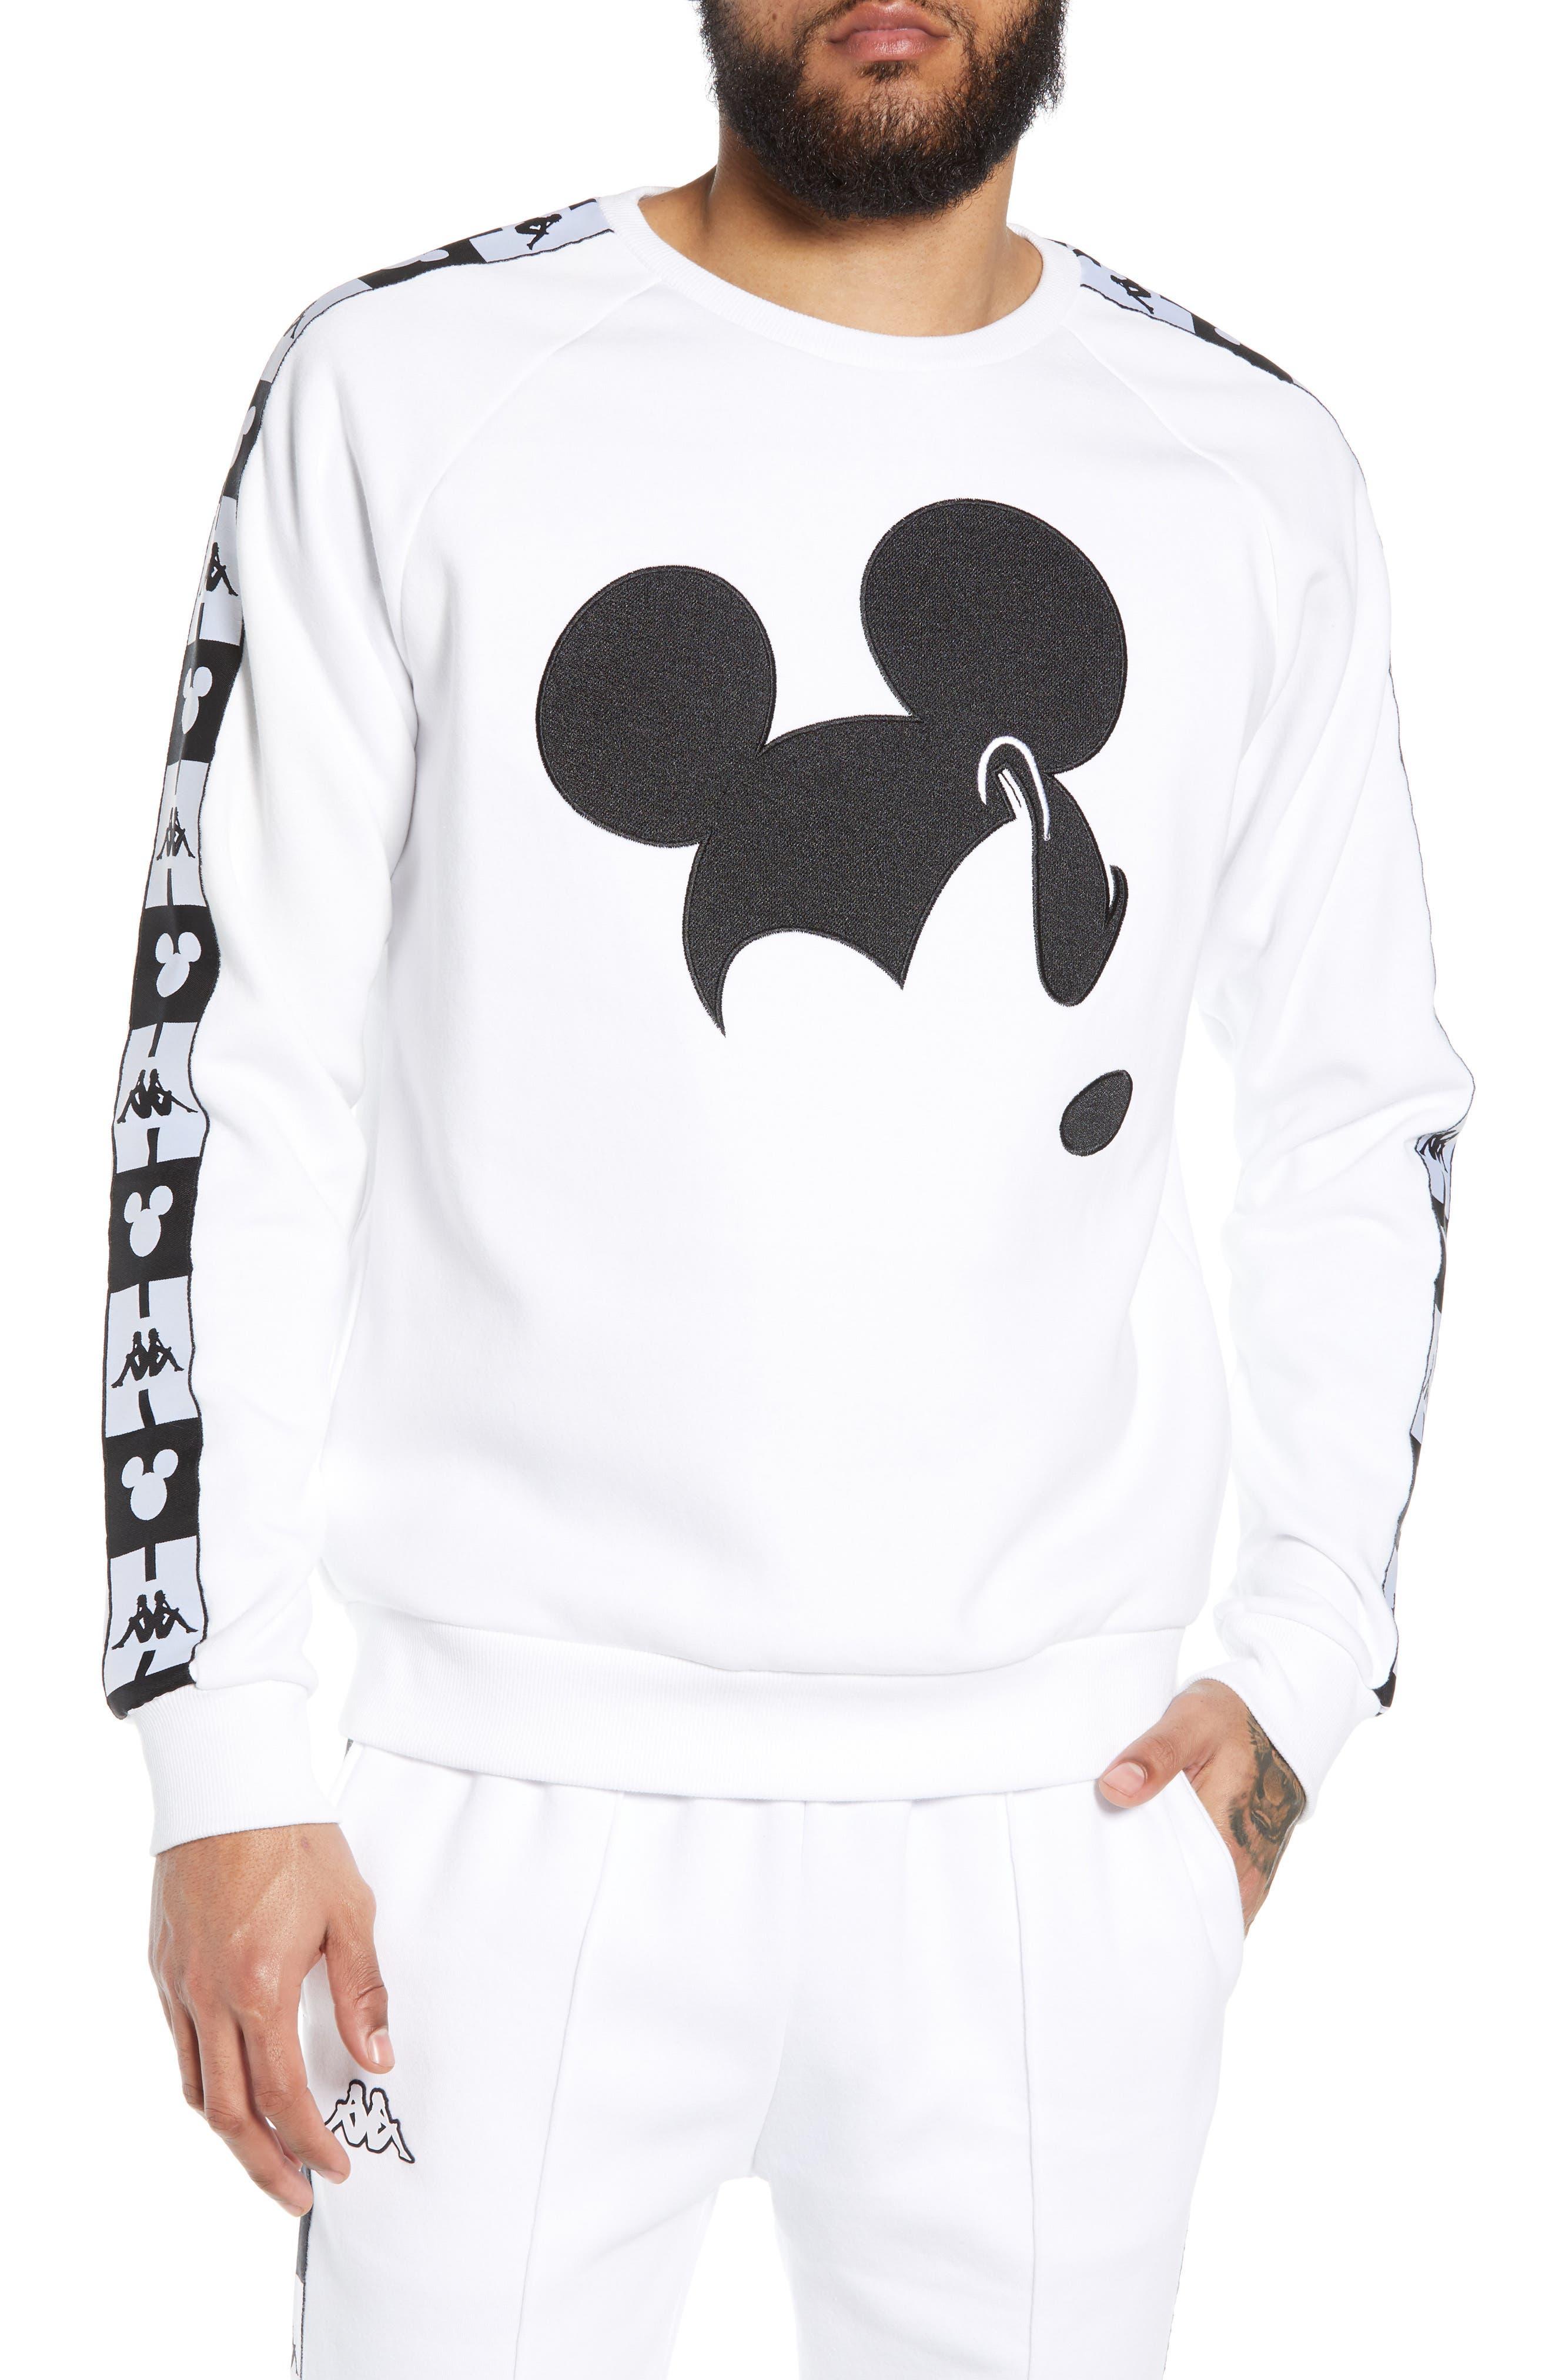 KAPPA x Disney<sup>®</sup> Authentic Audley Sweatshirt, Main, color, 100